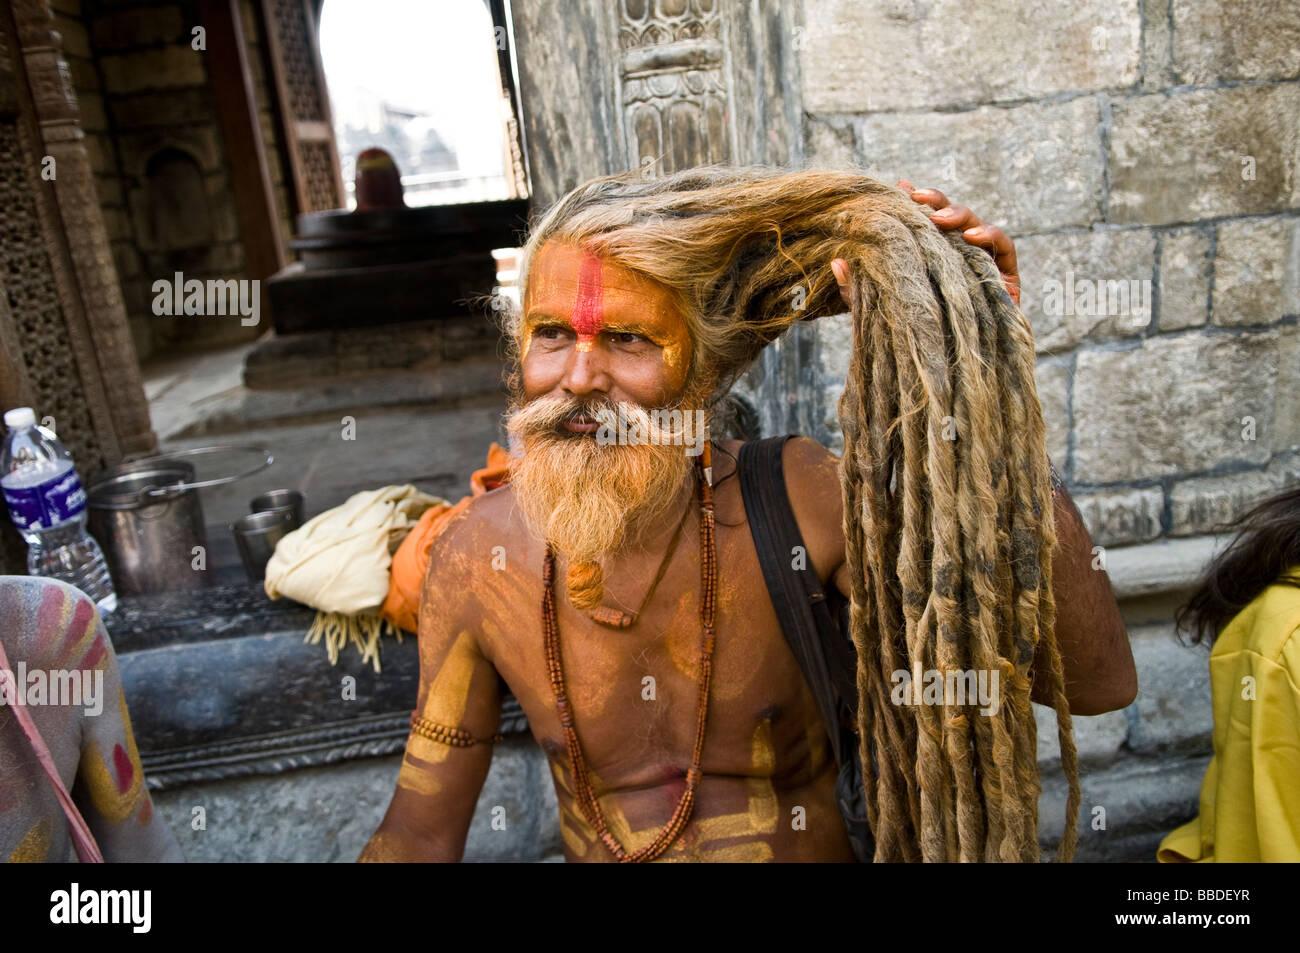 An Indian Sadhu Holy Man With Very Long Rasta Style